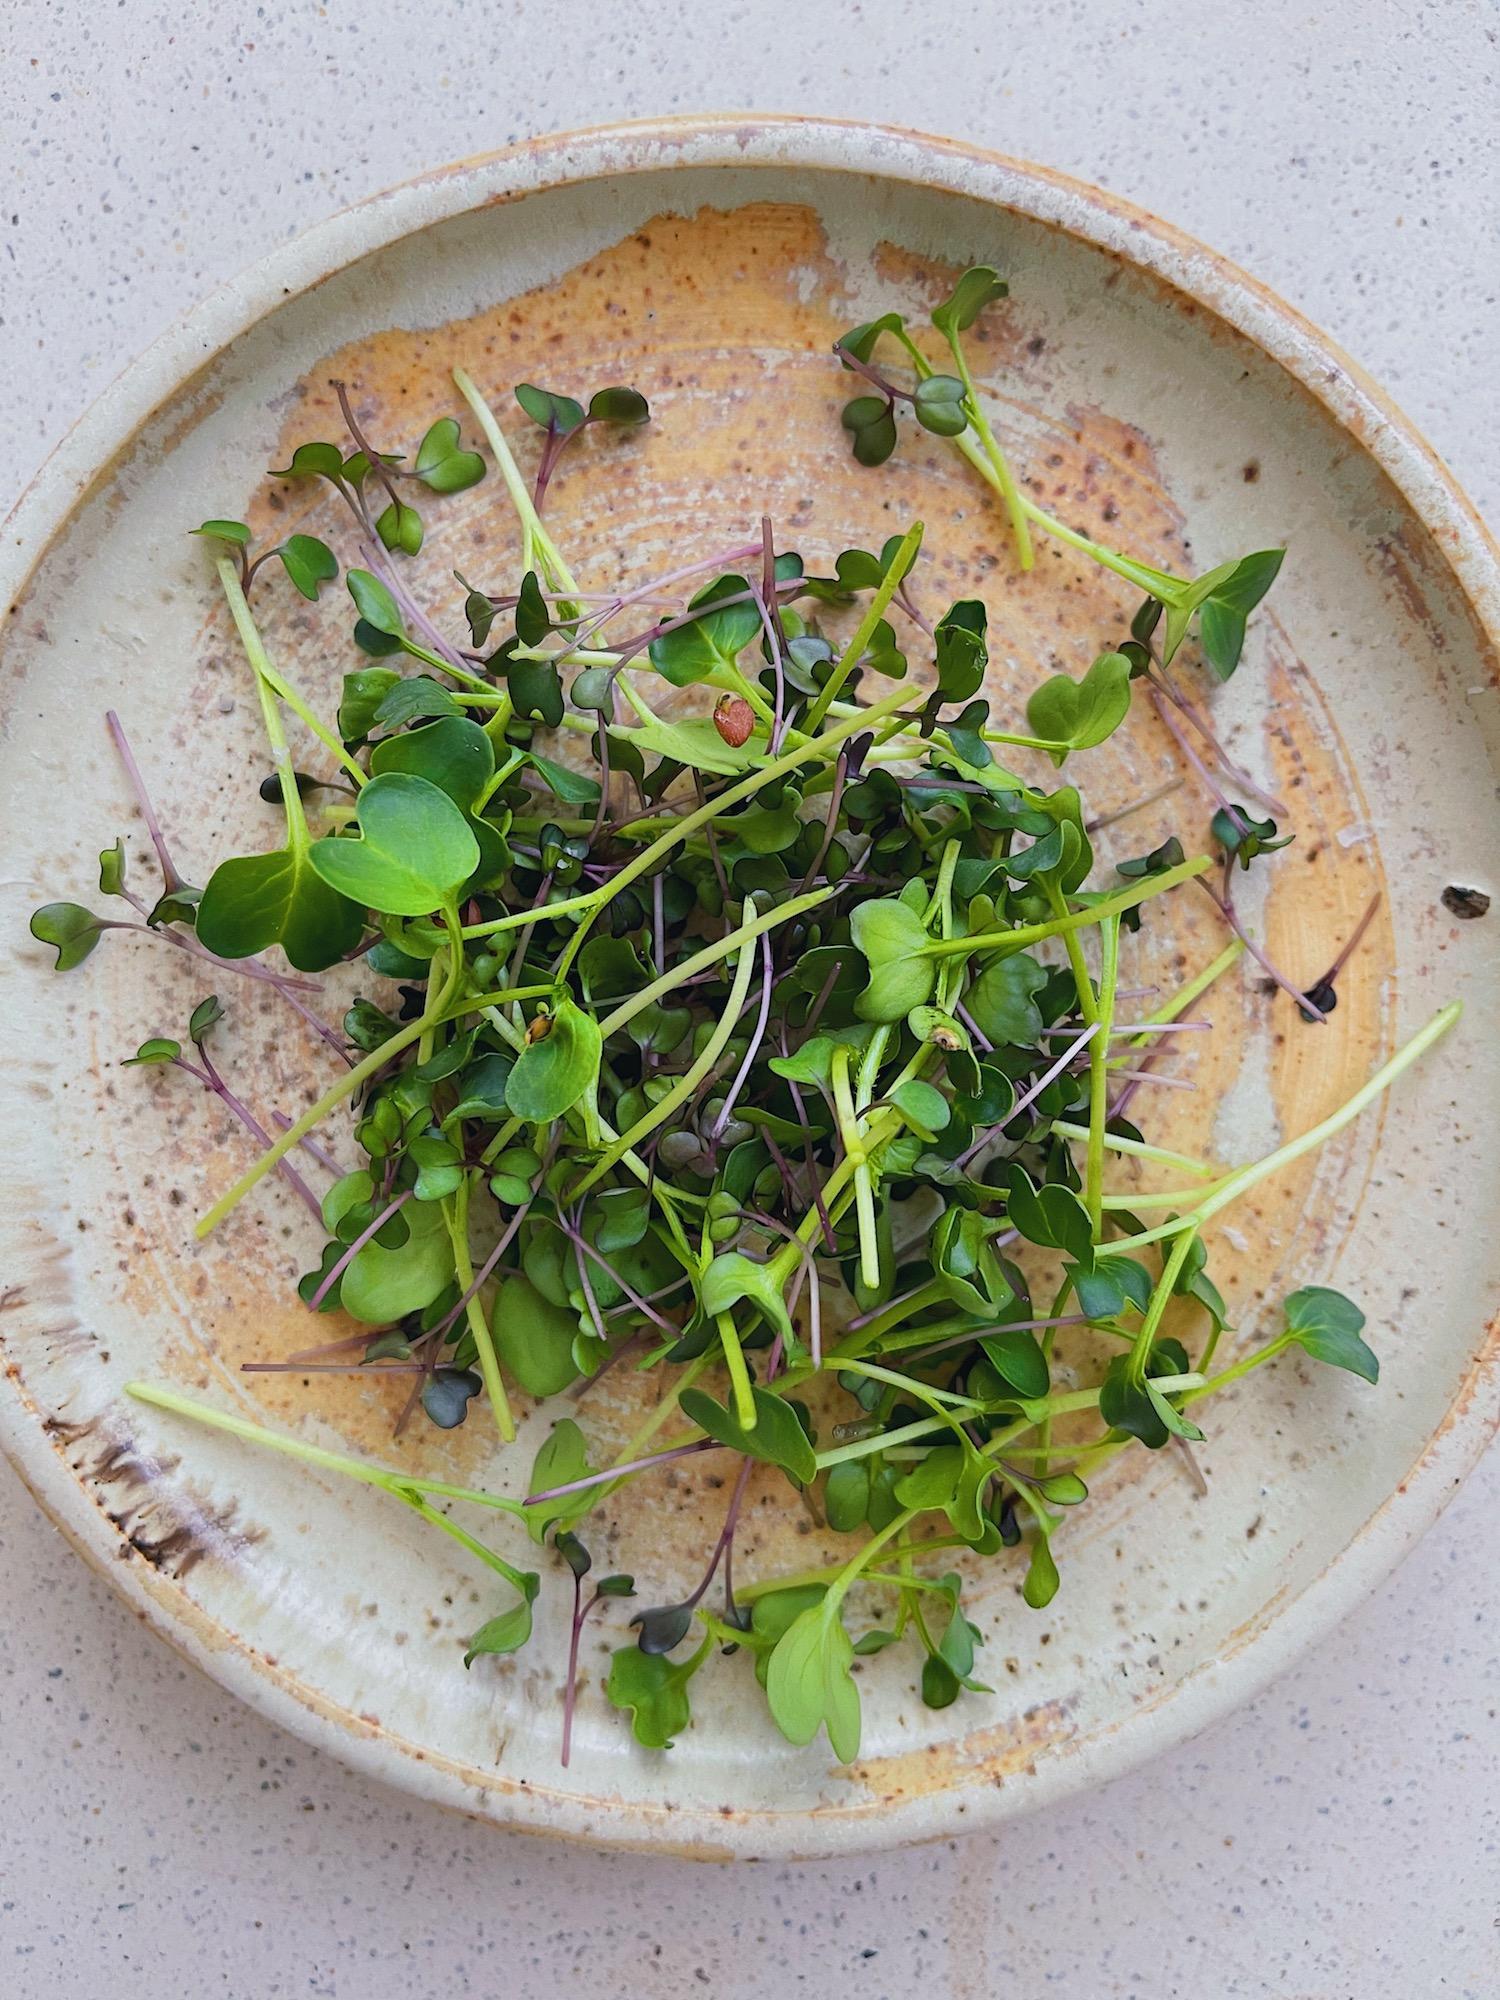 wu-haus-recipe-vegan-broccoli-caesar-food